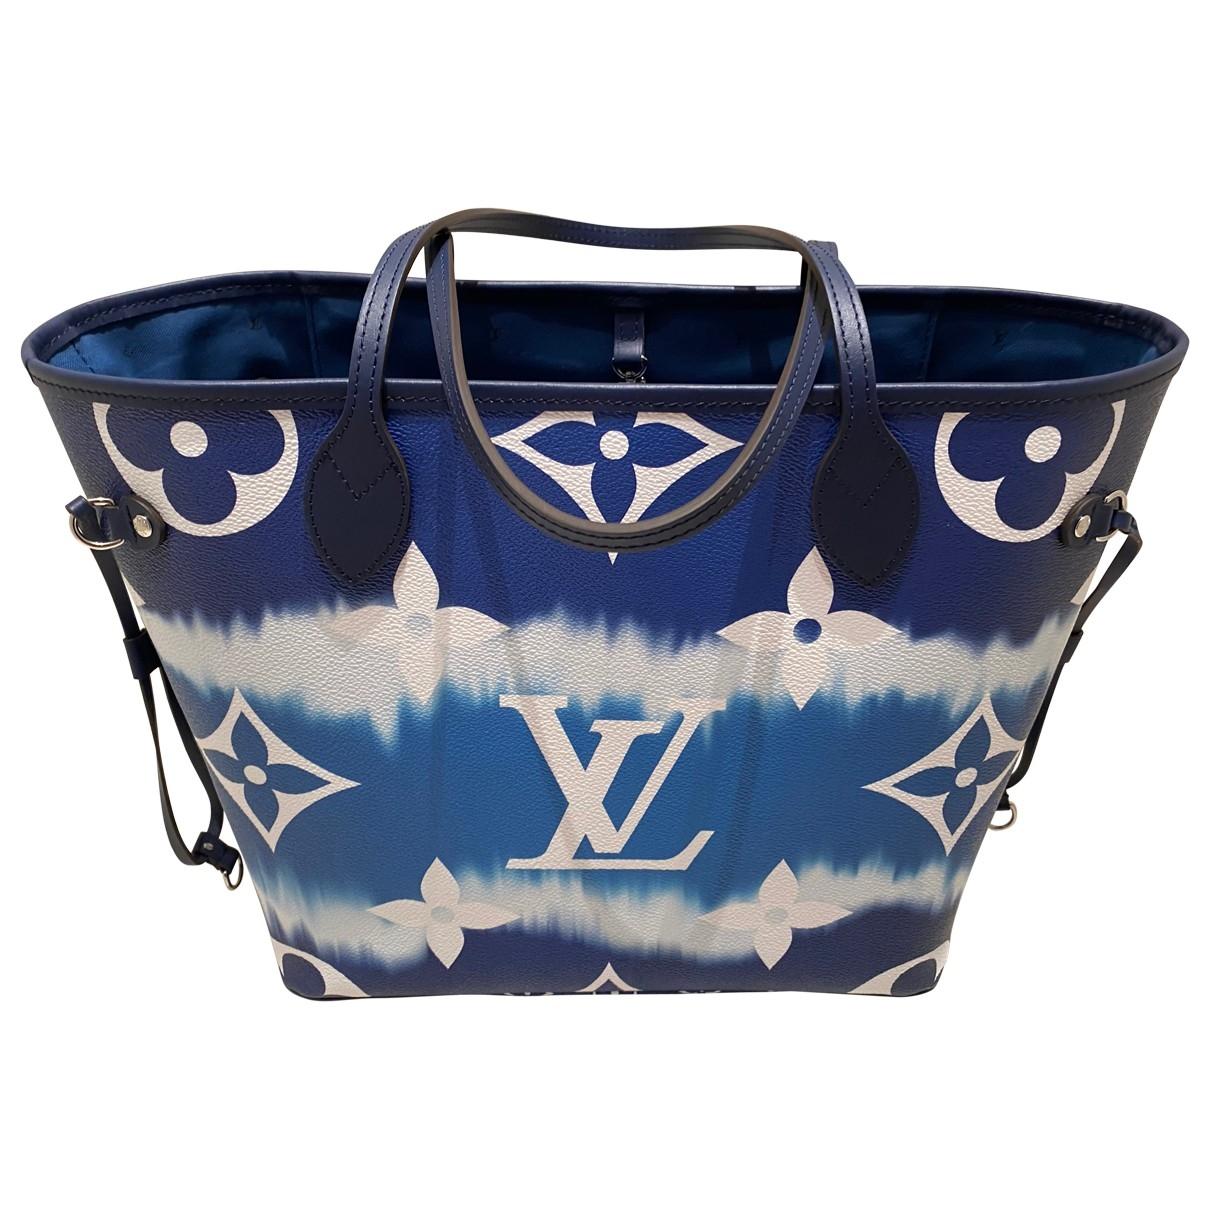 Louis Vuitton Neverfull Handtasche in  Blau Leinen